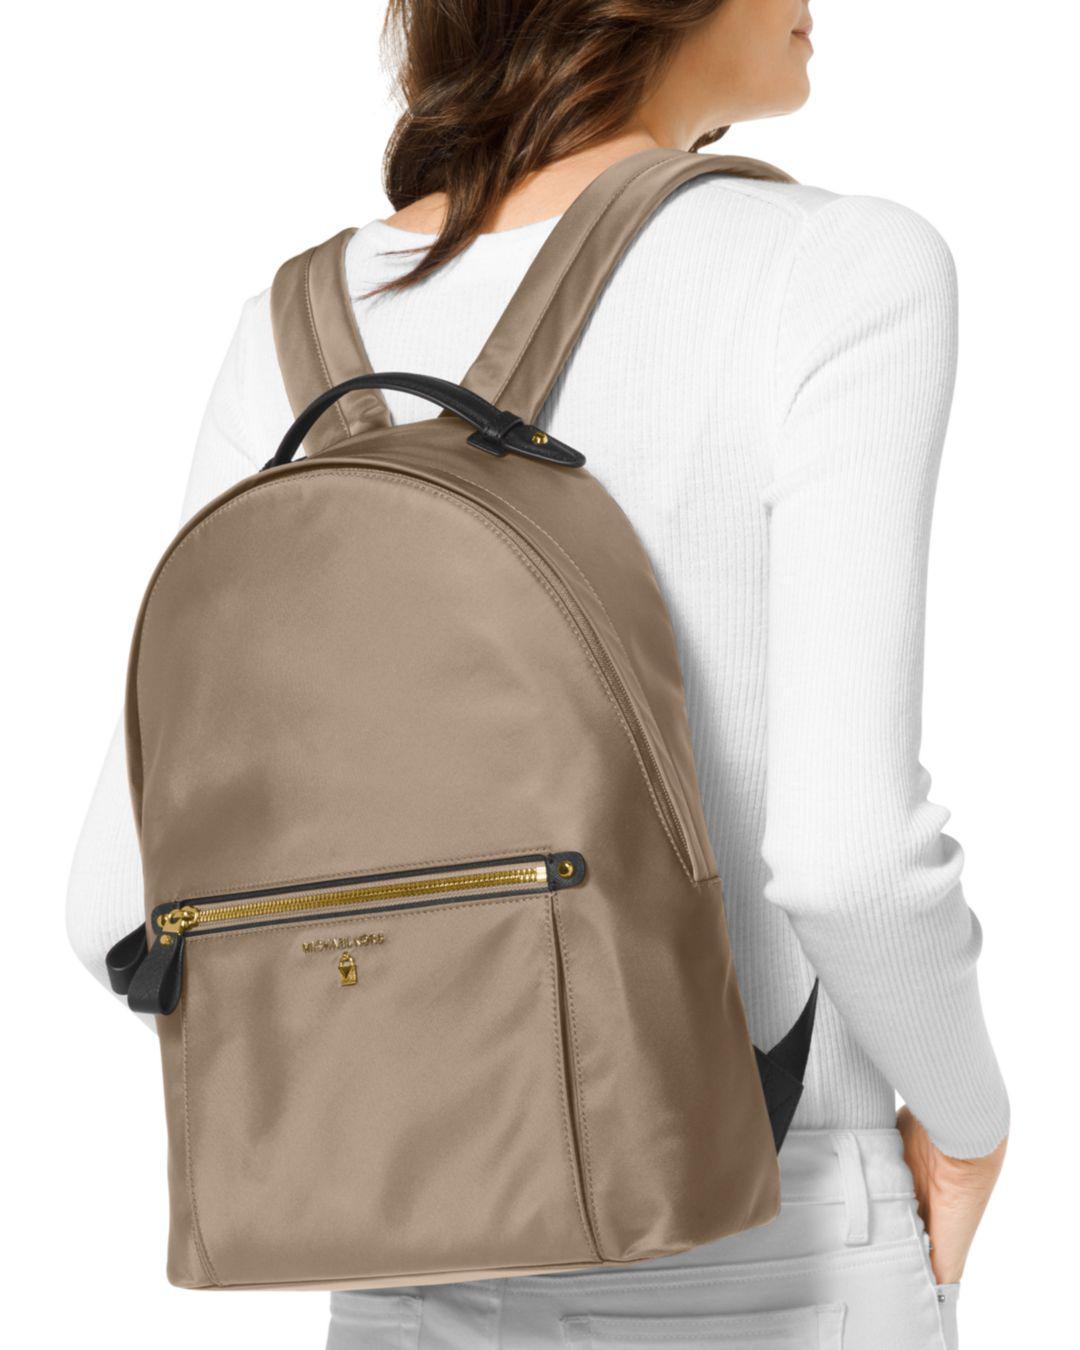 36094ed772f0 MICHAEL Michael Kors Nylon Kelsey Large Backpack ... - YouTube